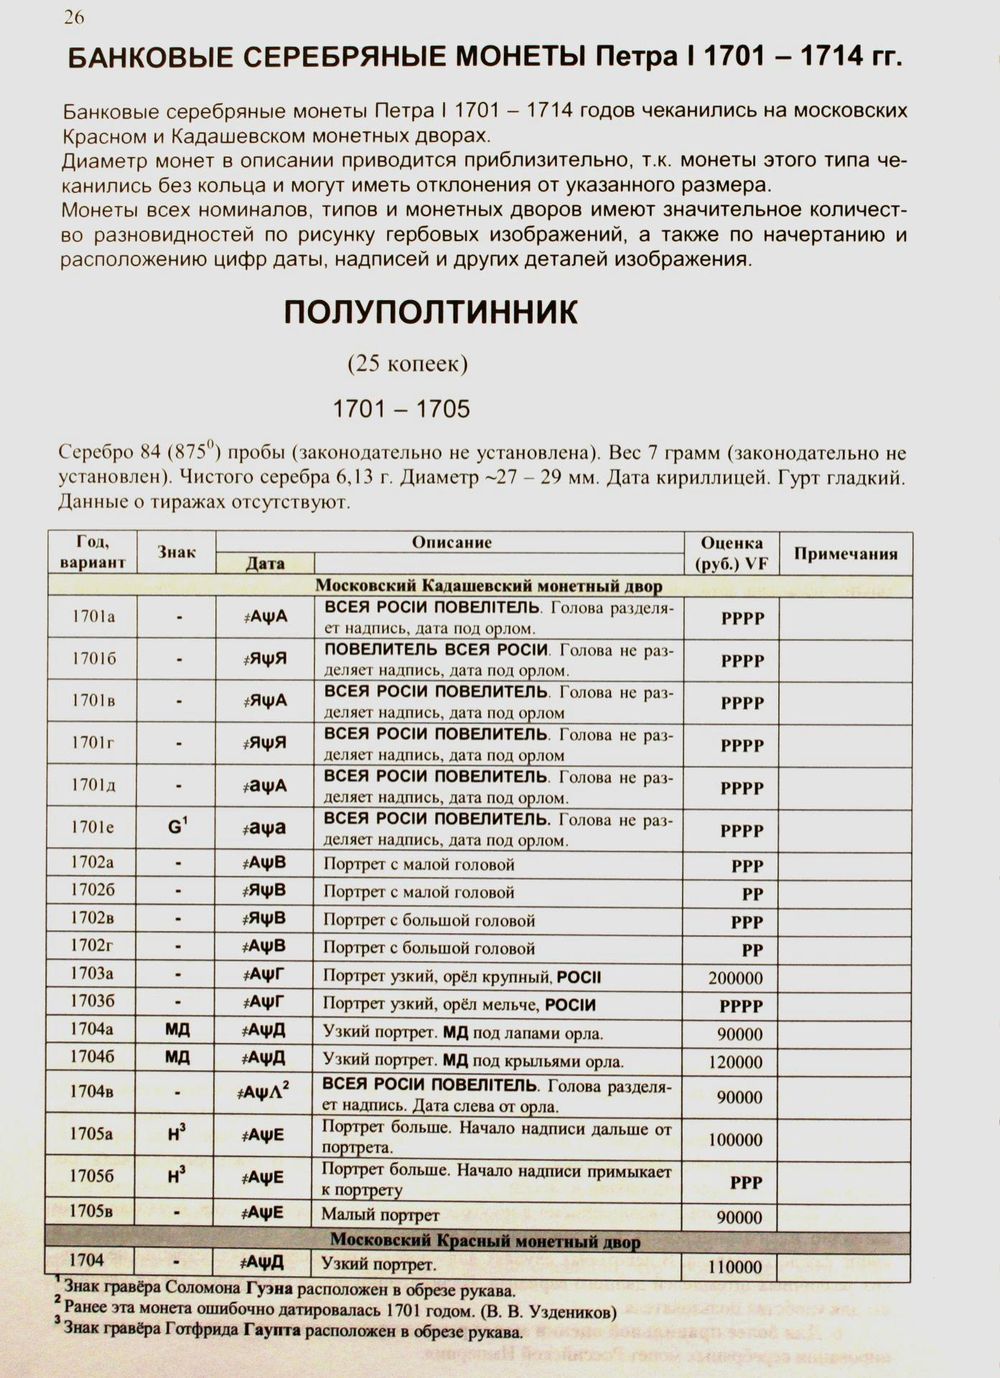 http://i2.imageban.ru/out/2015/10/15/3875d6c19d19b9d927e4c78df93fdf09.jpg